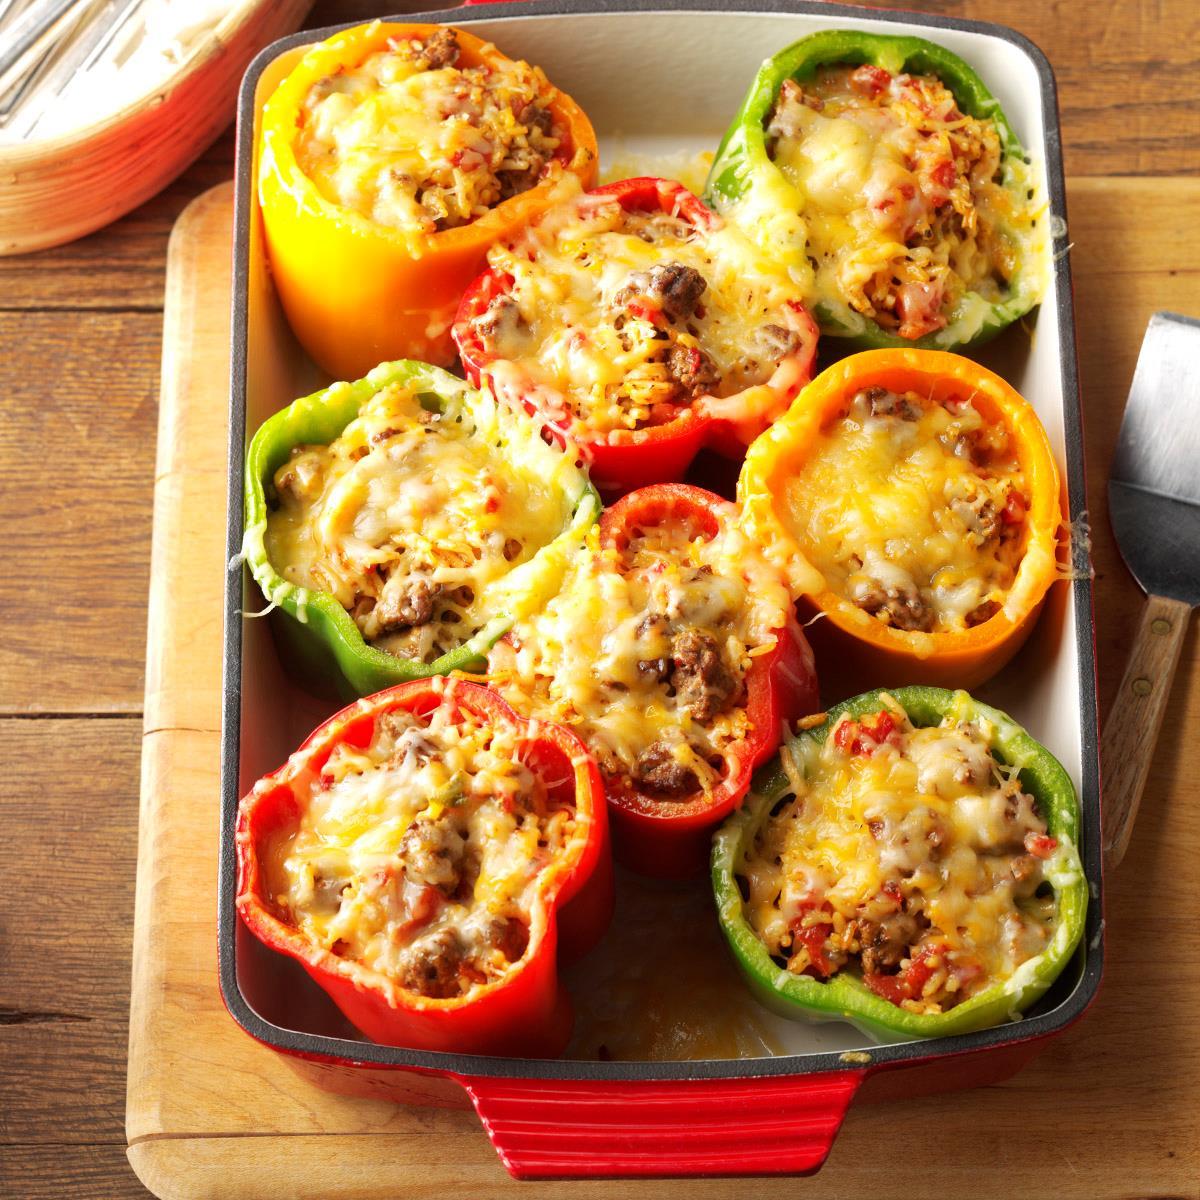 Carolina S Mexican Food Salsa Recipe